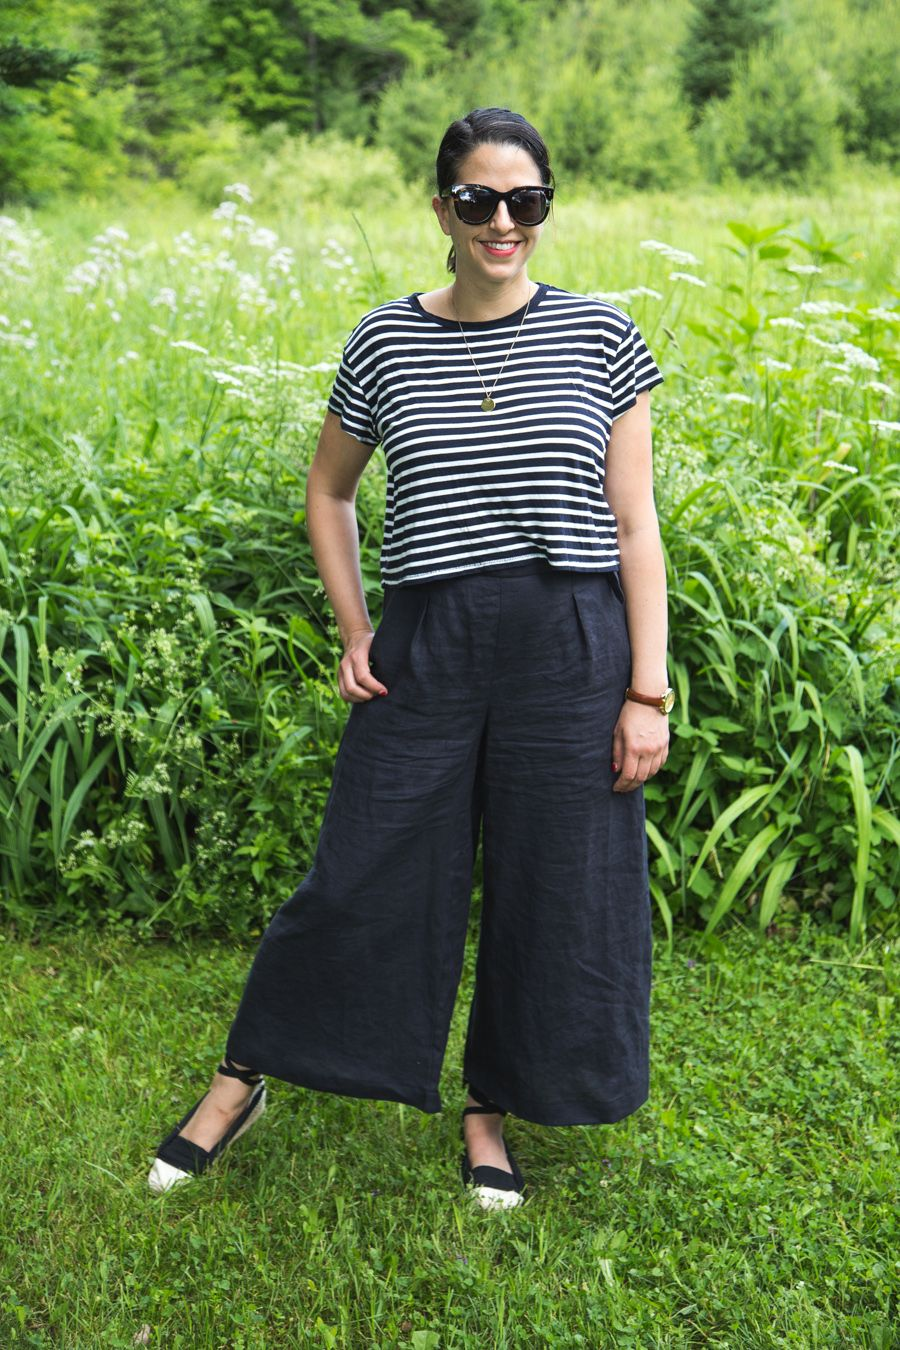 Summer Sewing! The Flint Pants from Megan Nielsen